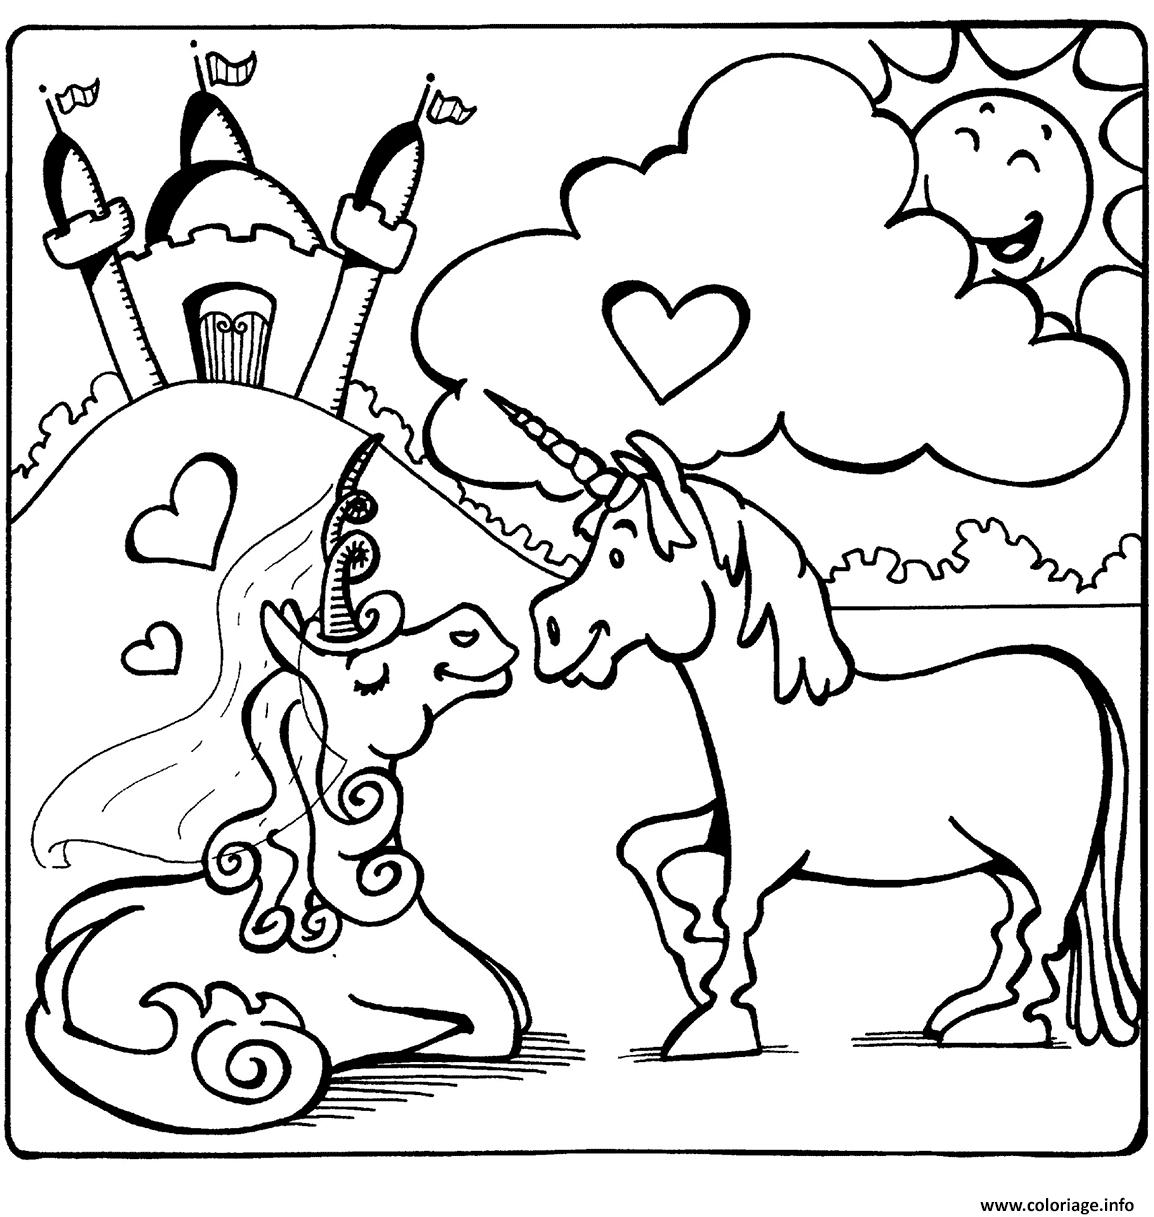 Dessin licornes in love Coloriage Gratuit à Imprimer